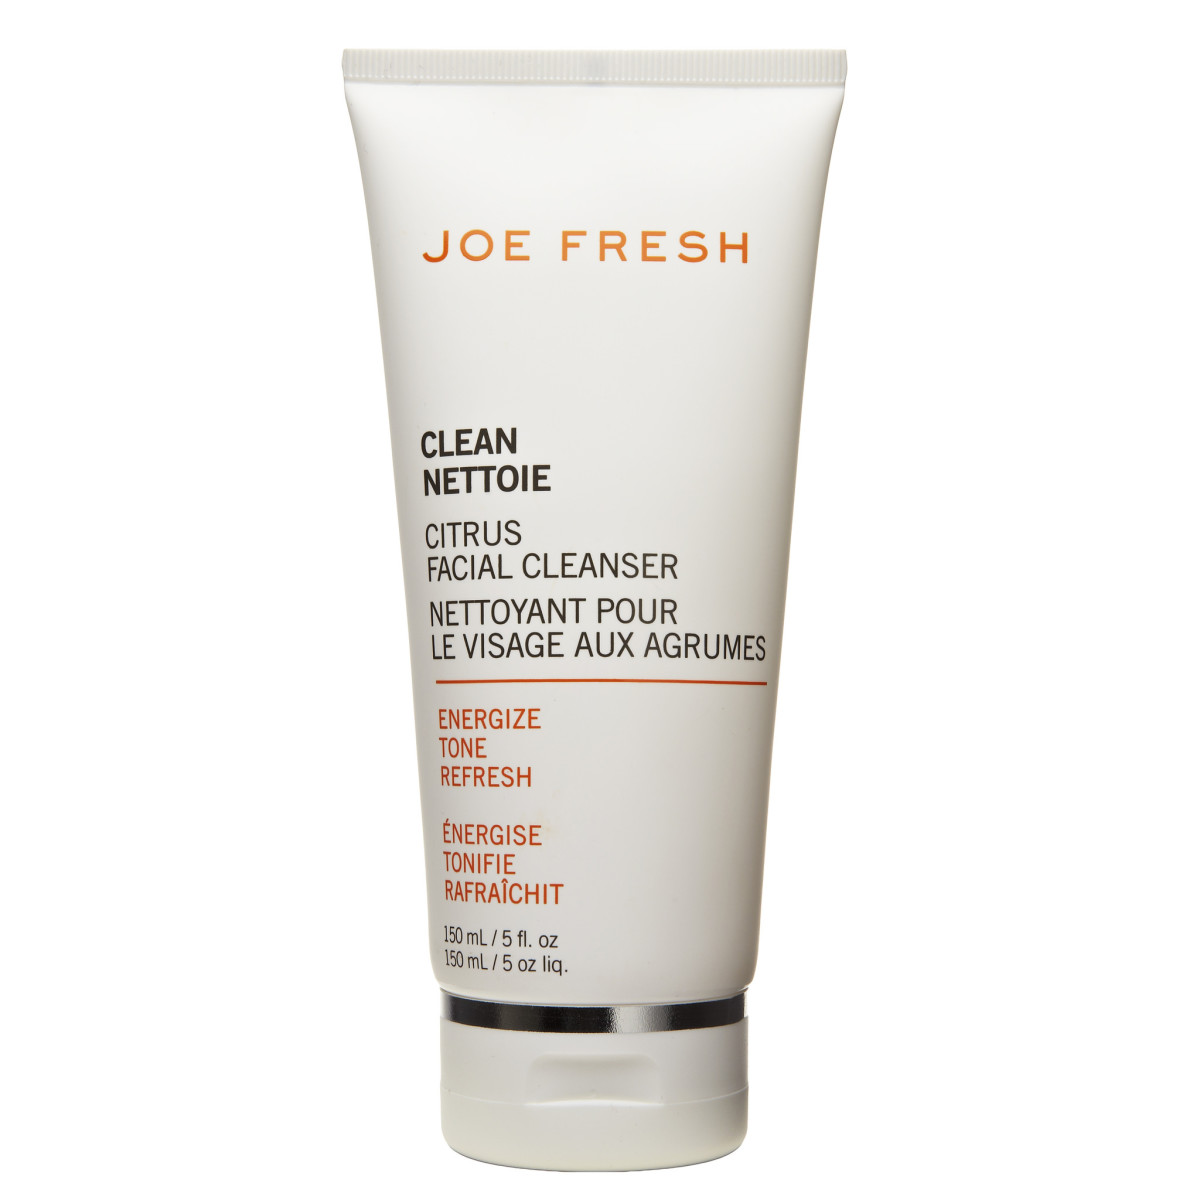 Joe Fresh Citrus Facial Cleanser